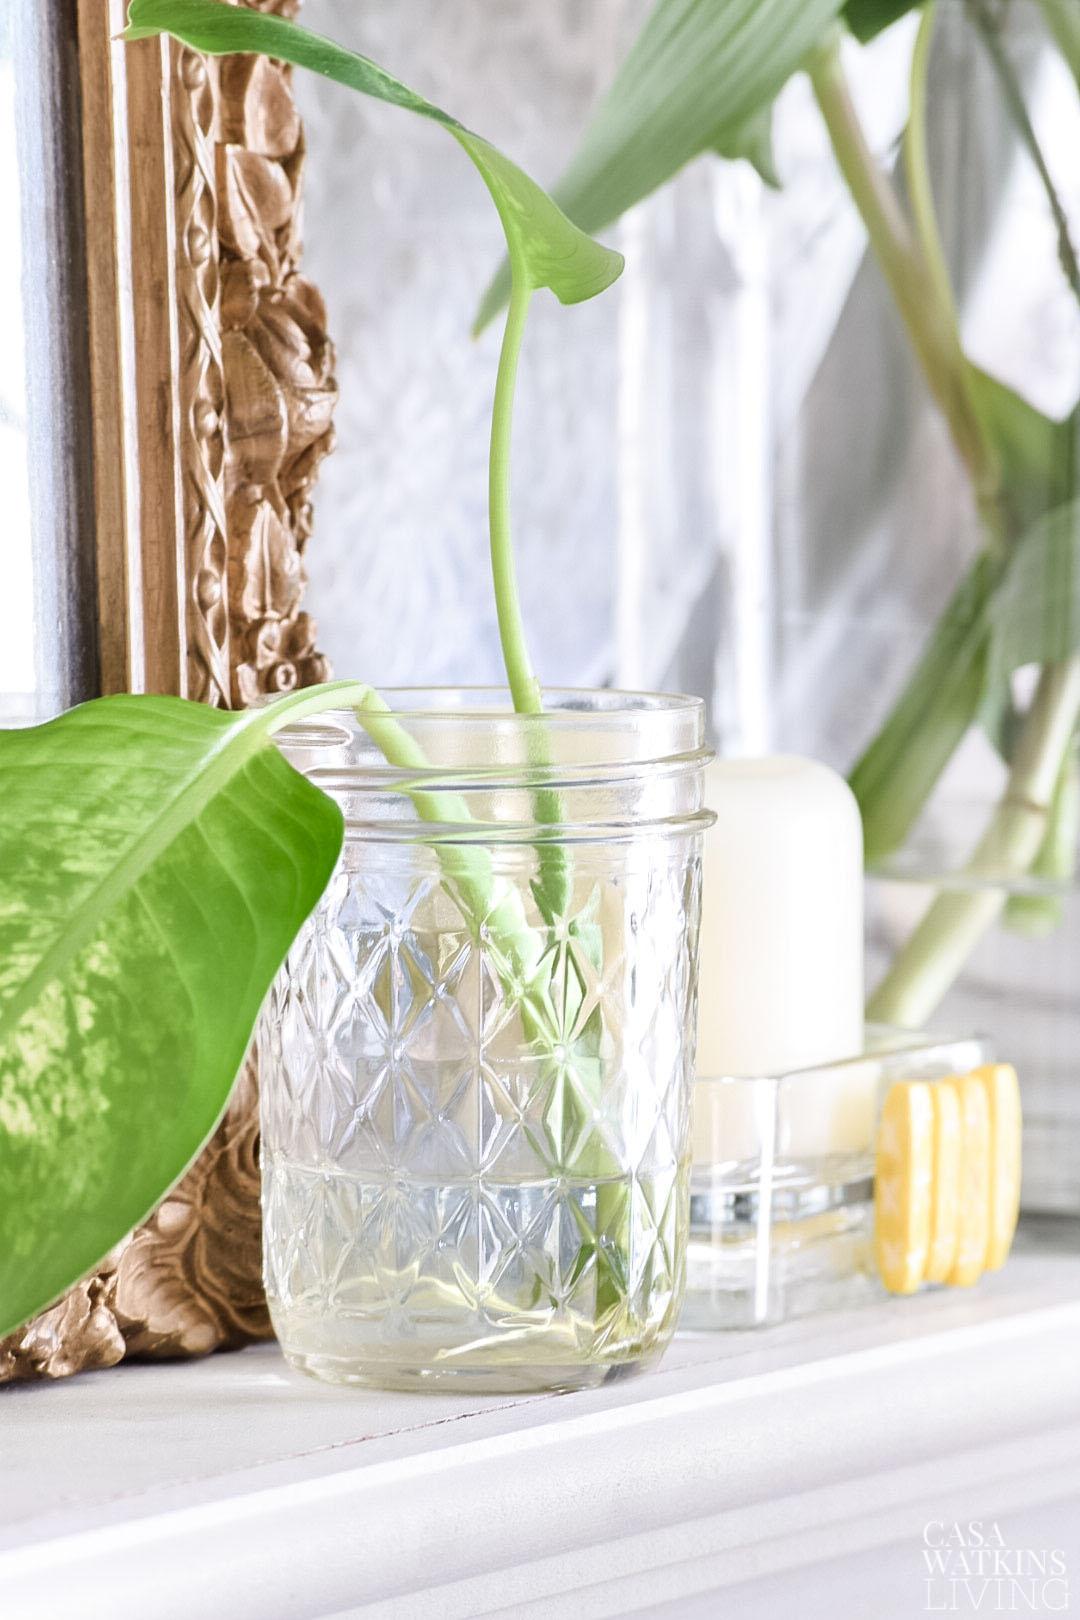 mason jars with plant leaves